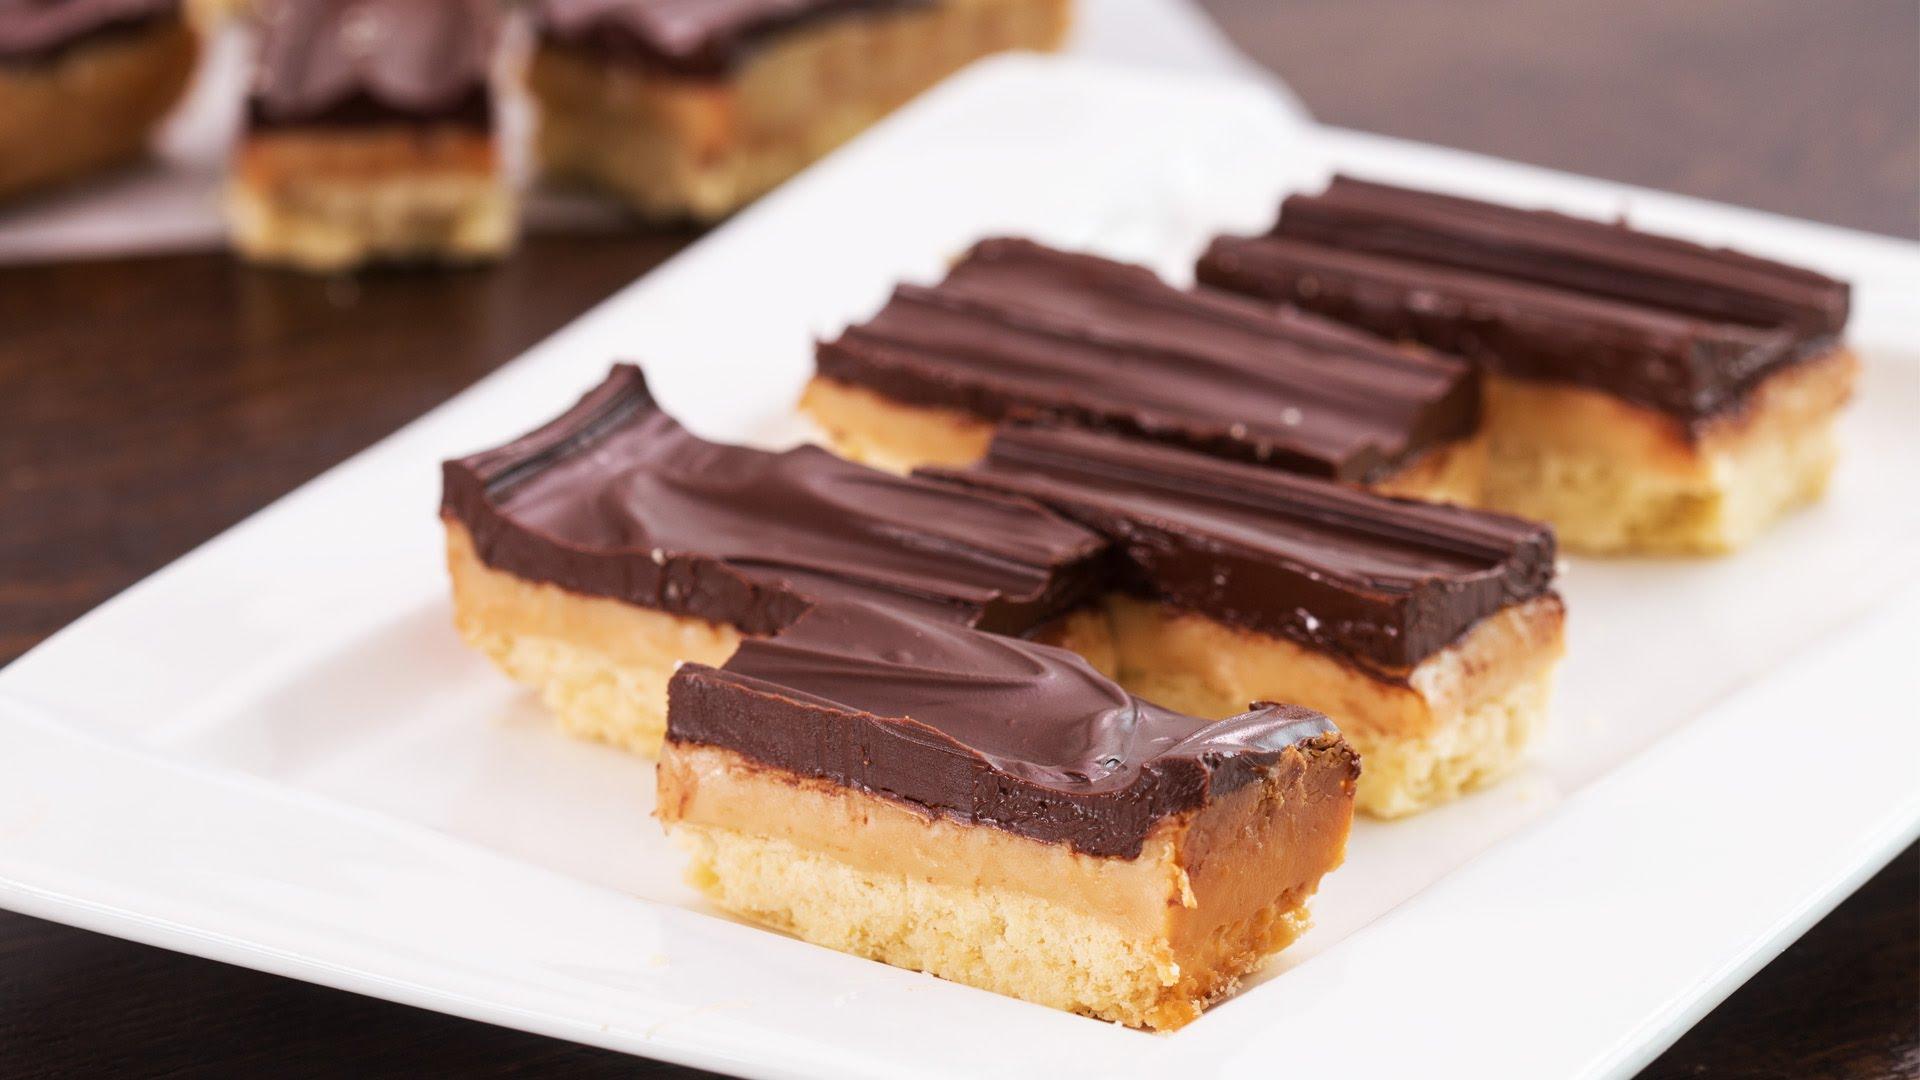 How to Make a Candy Bar Cheesecake